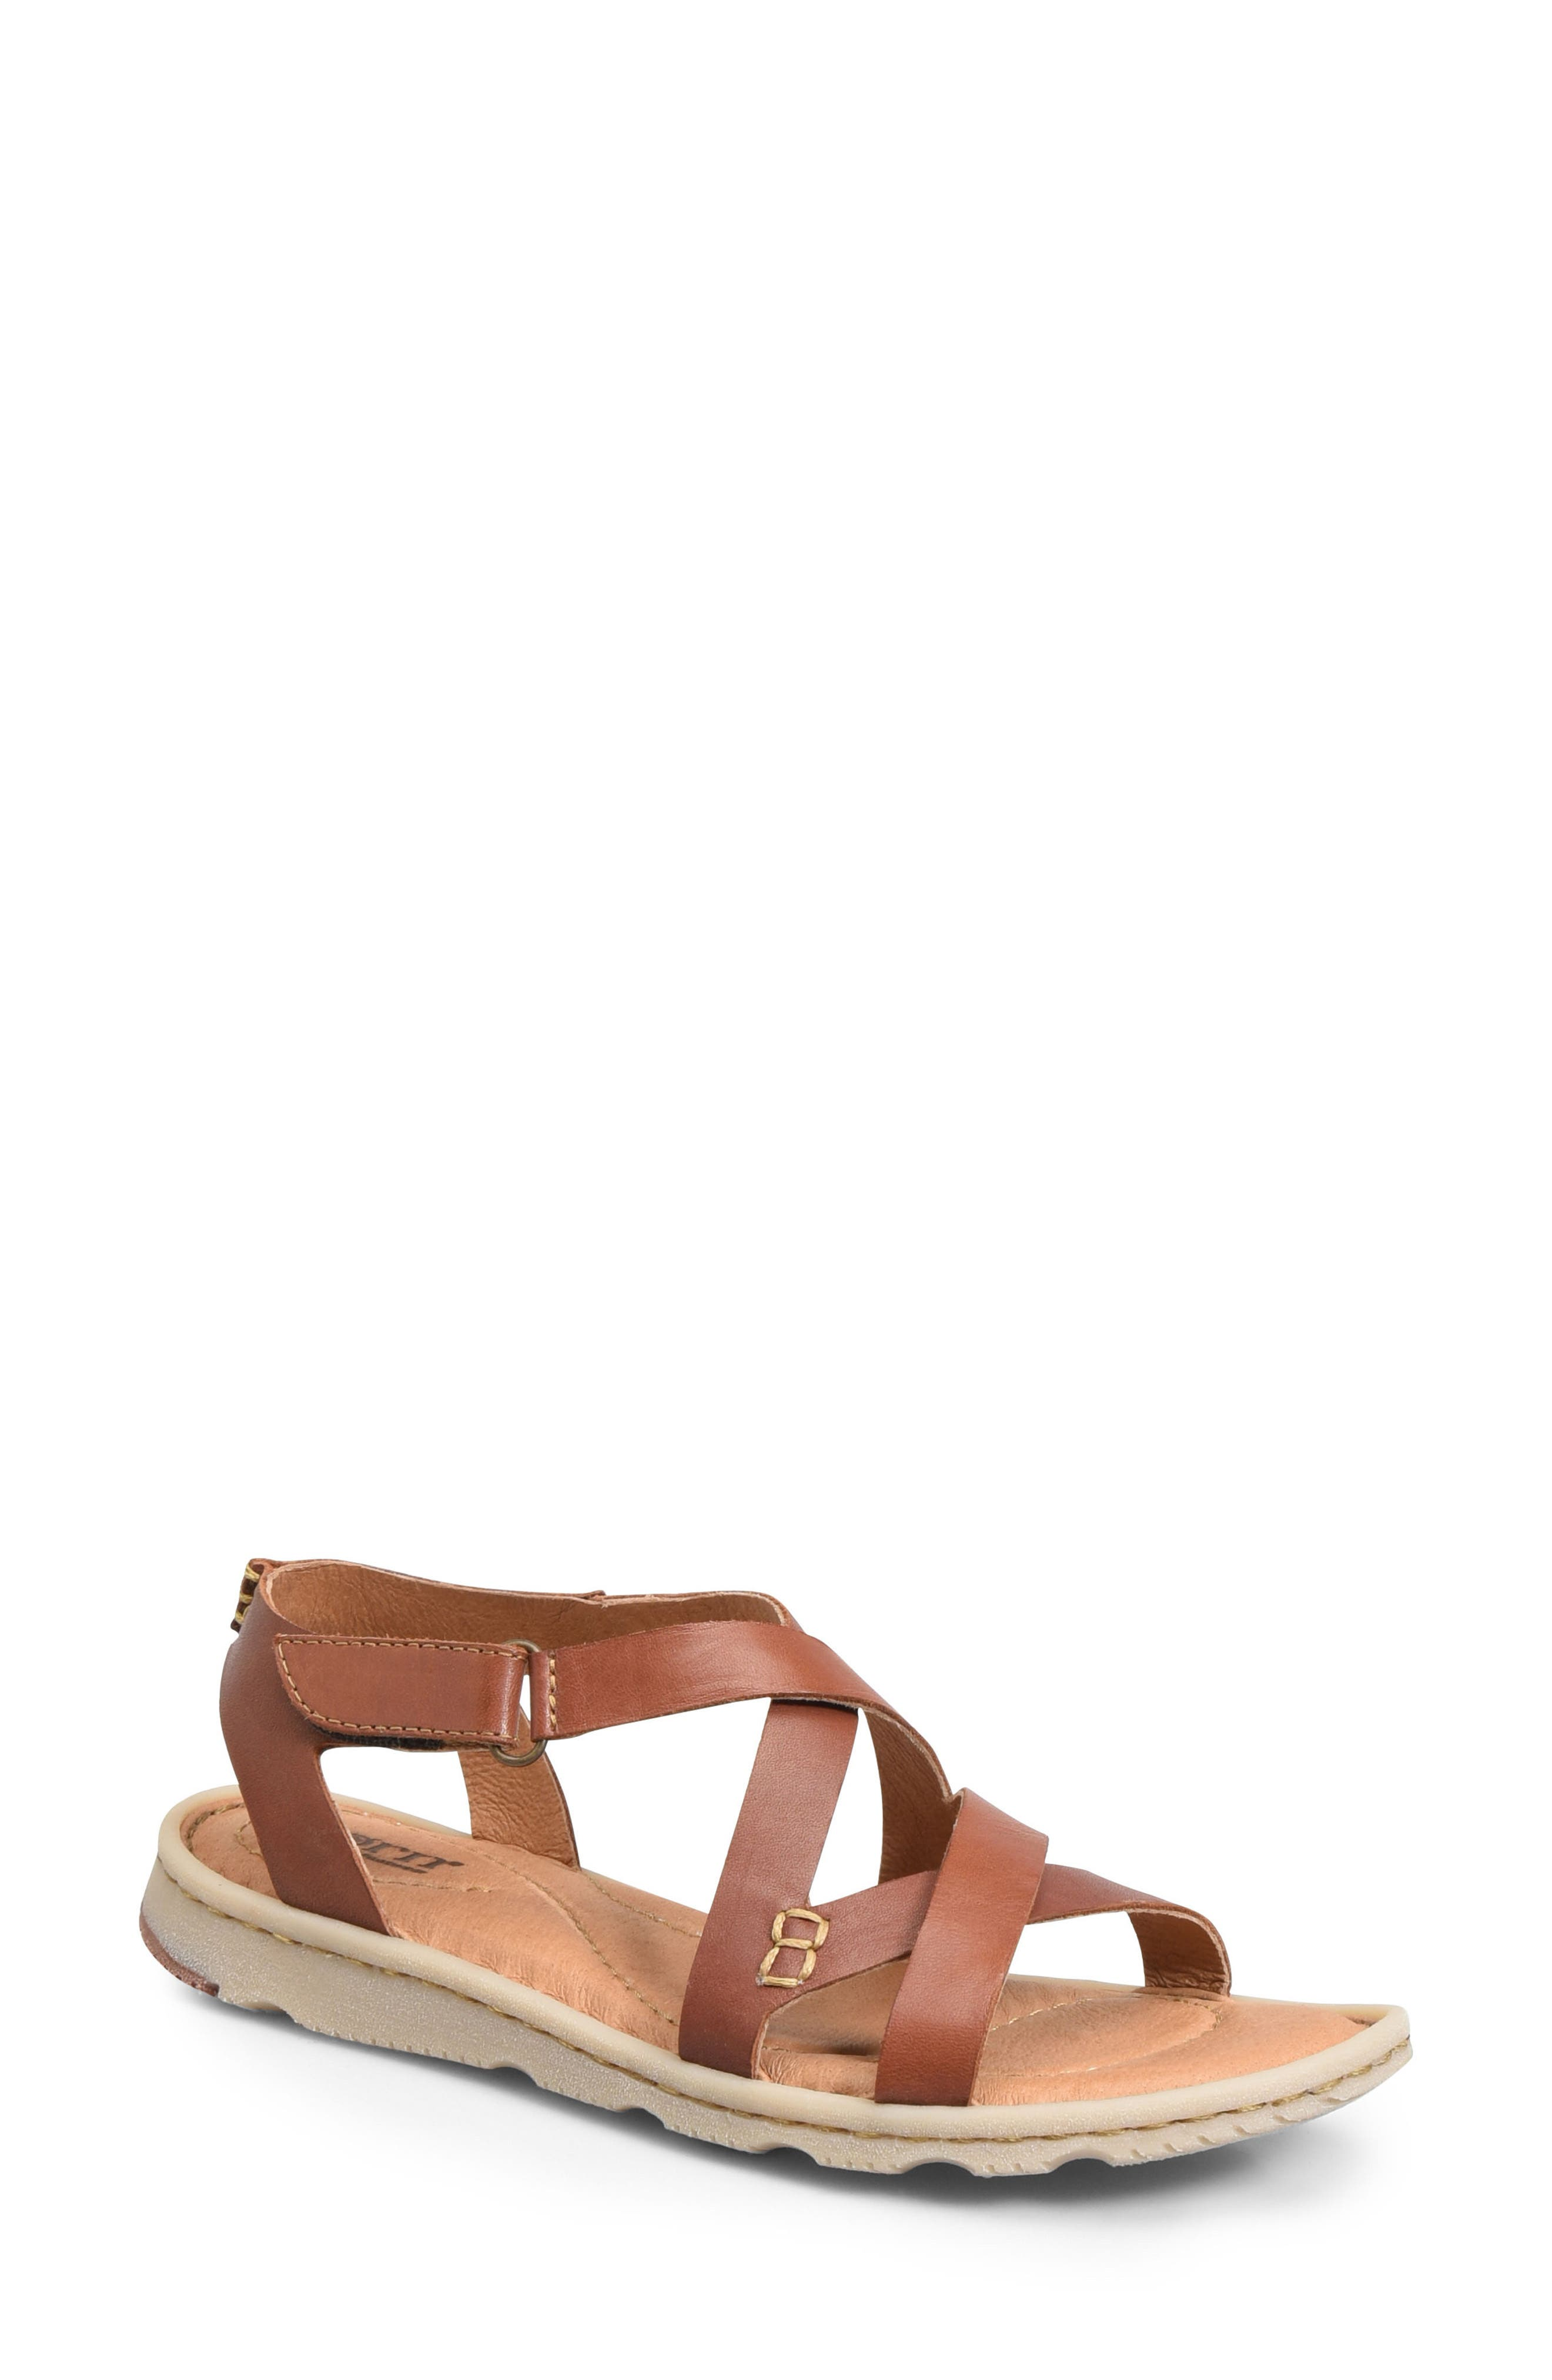 Trinidad Sandal,                         Main,                         color, BROWN LEATHER